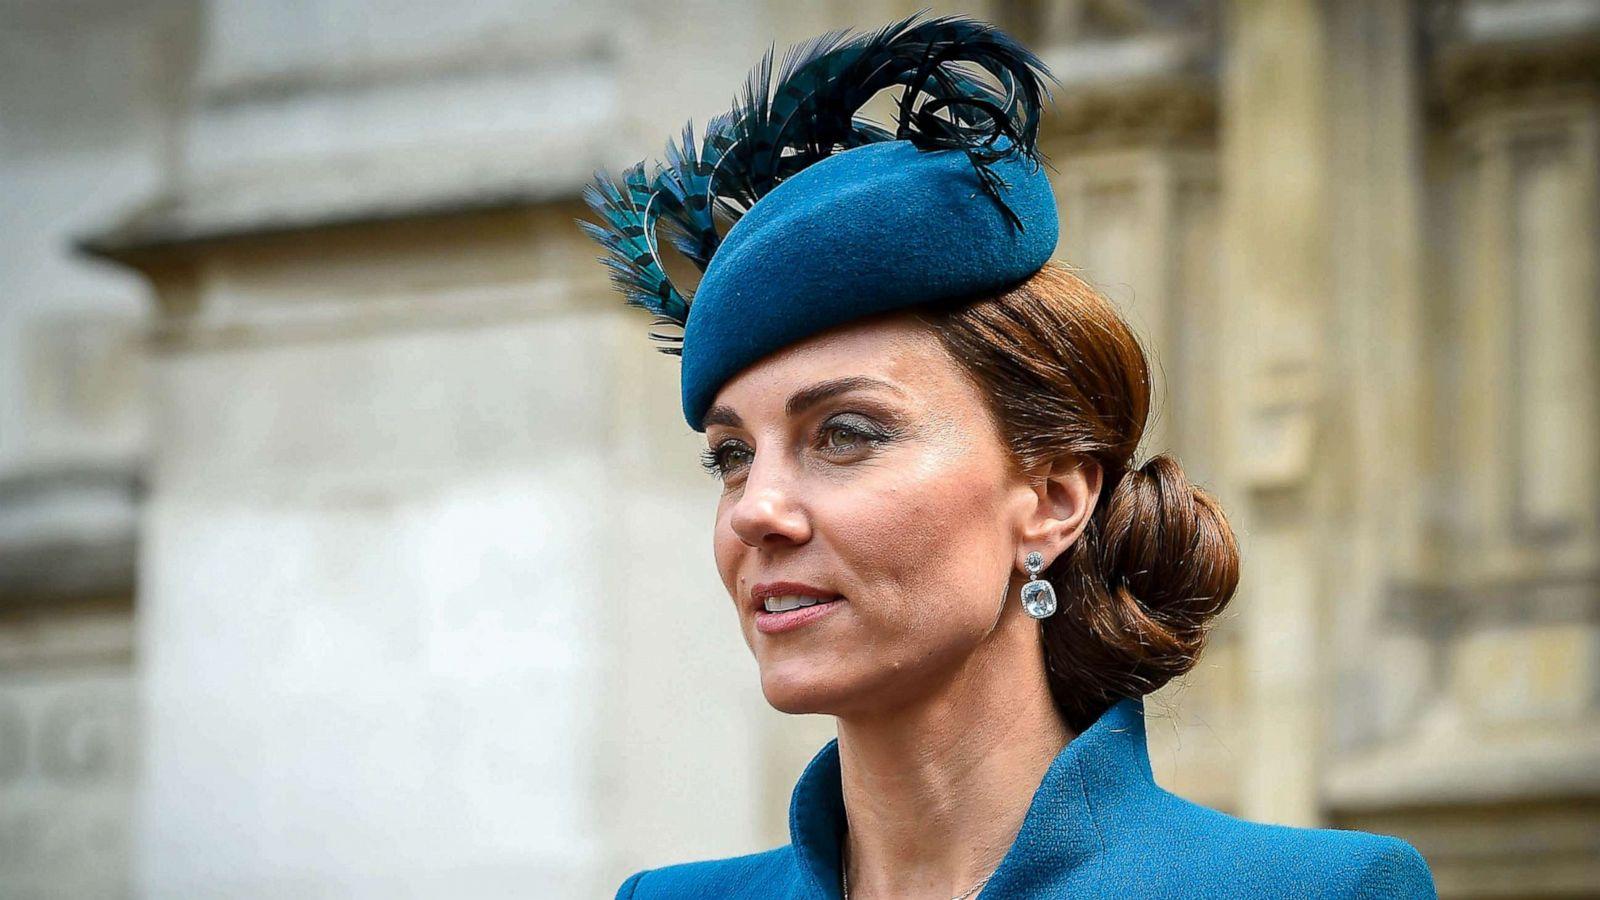 Prince William Kate Visit Meghan Amid Rumors Of Royal Rift